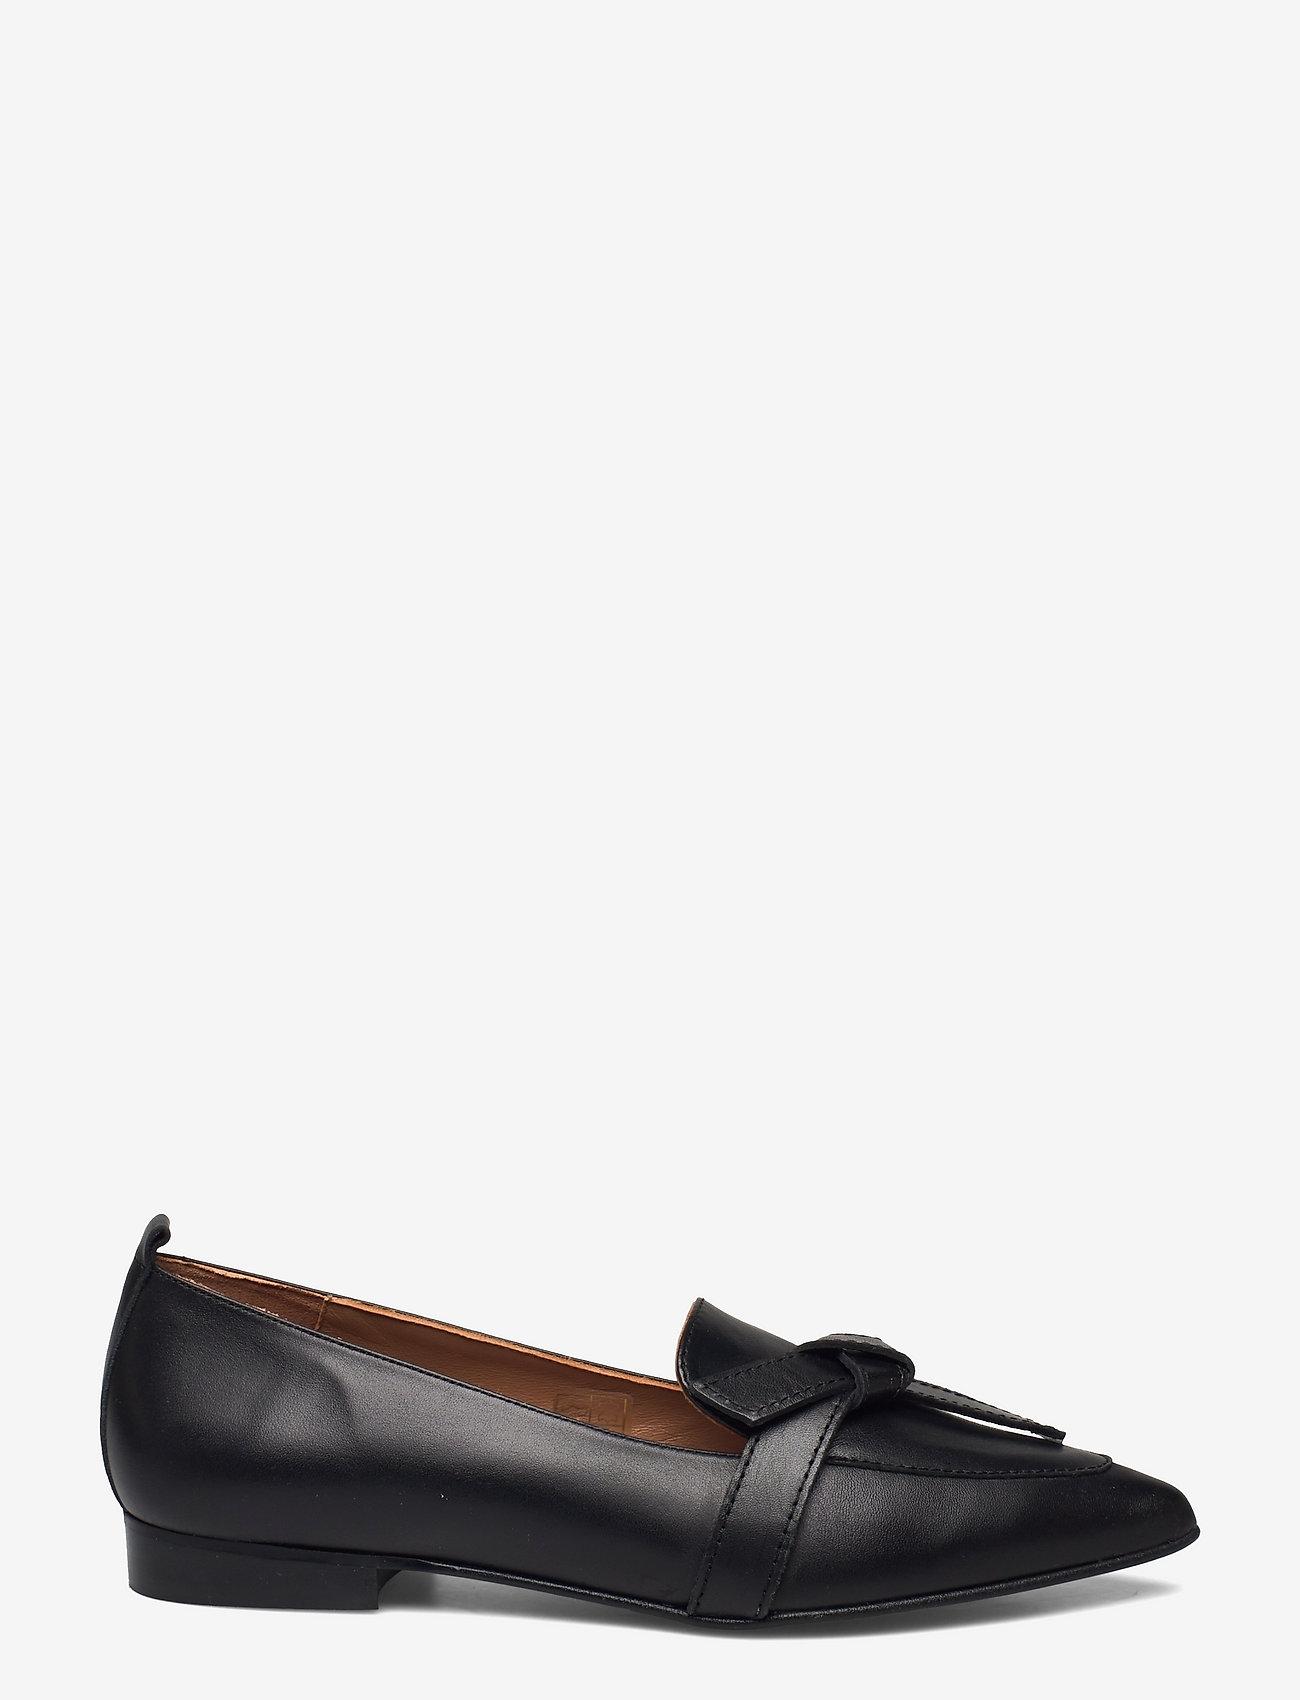 Flattered - Ally Black Grained Leather - mokasyny - black - 1